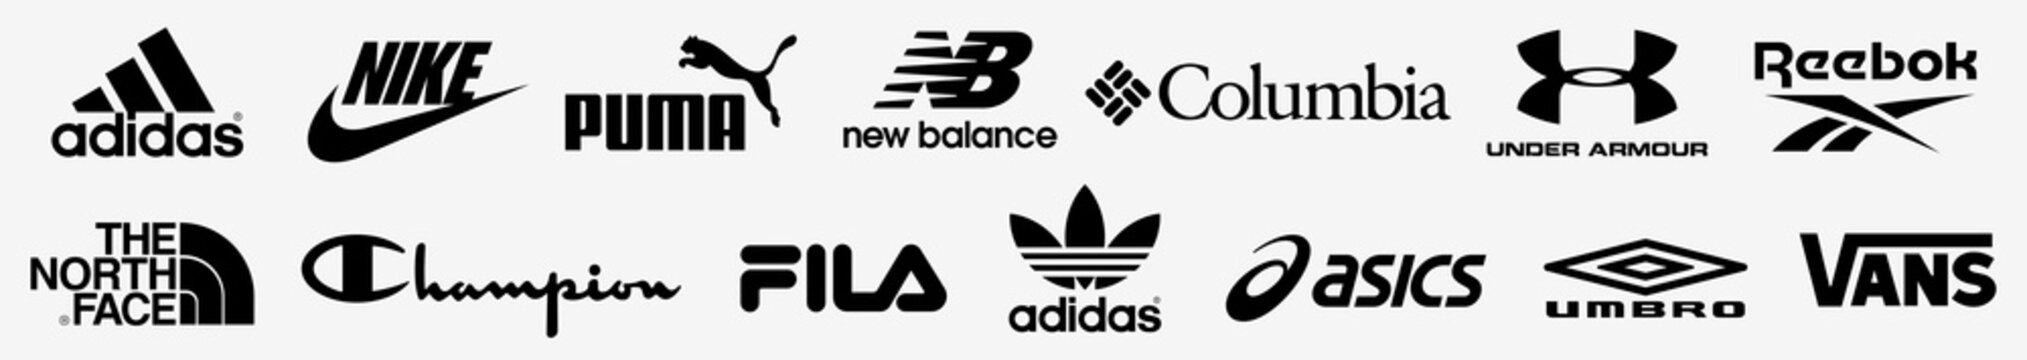 Adidas, Nike, The North Face, Reebok, Puma, Under Armour, Columbia , Asics, New balance, Champion, Fila logo. Sportswear logos set vector. Editorial